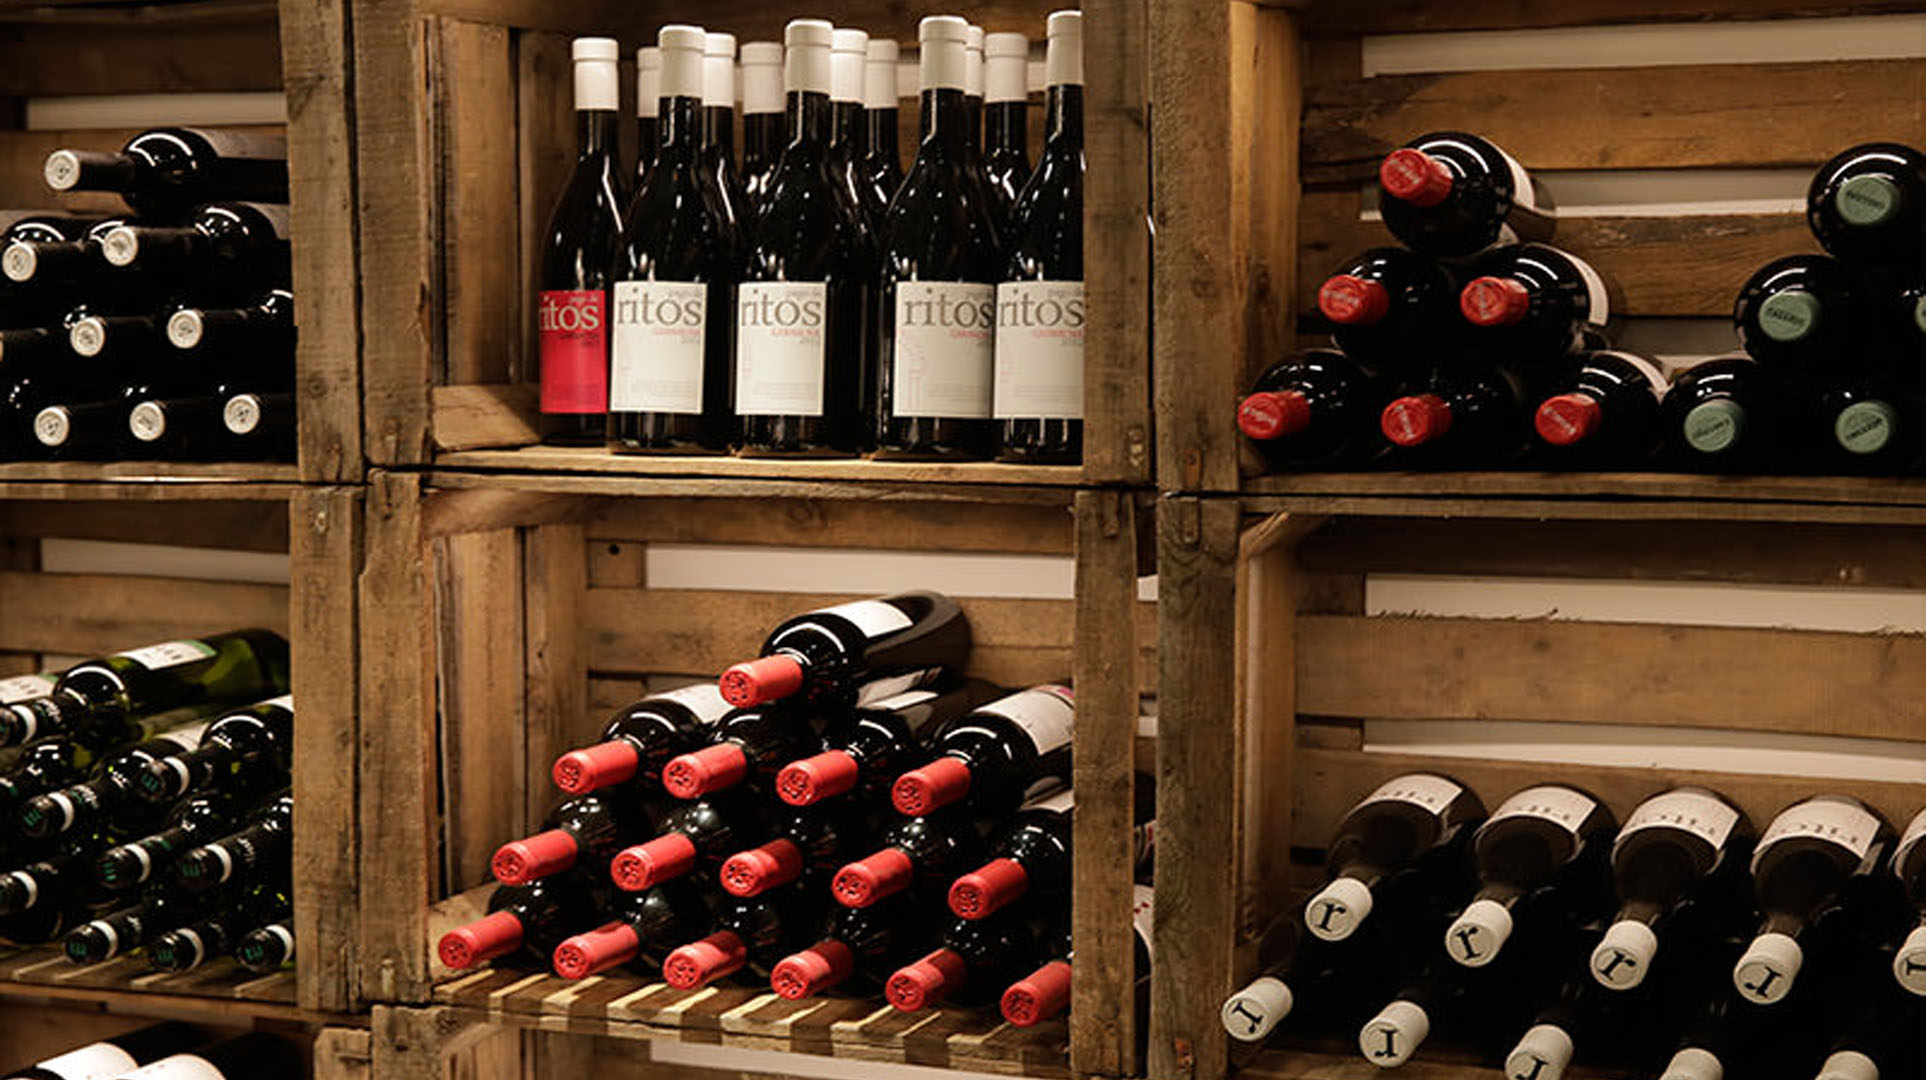 cavas para vinos a medida